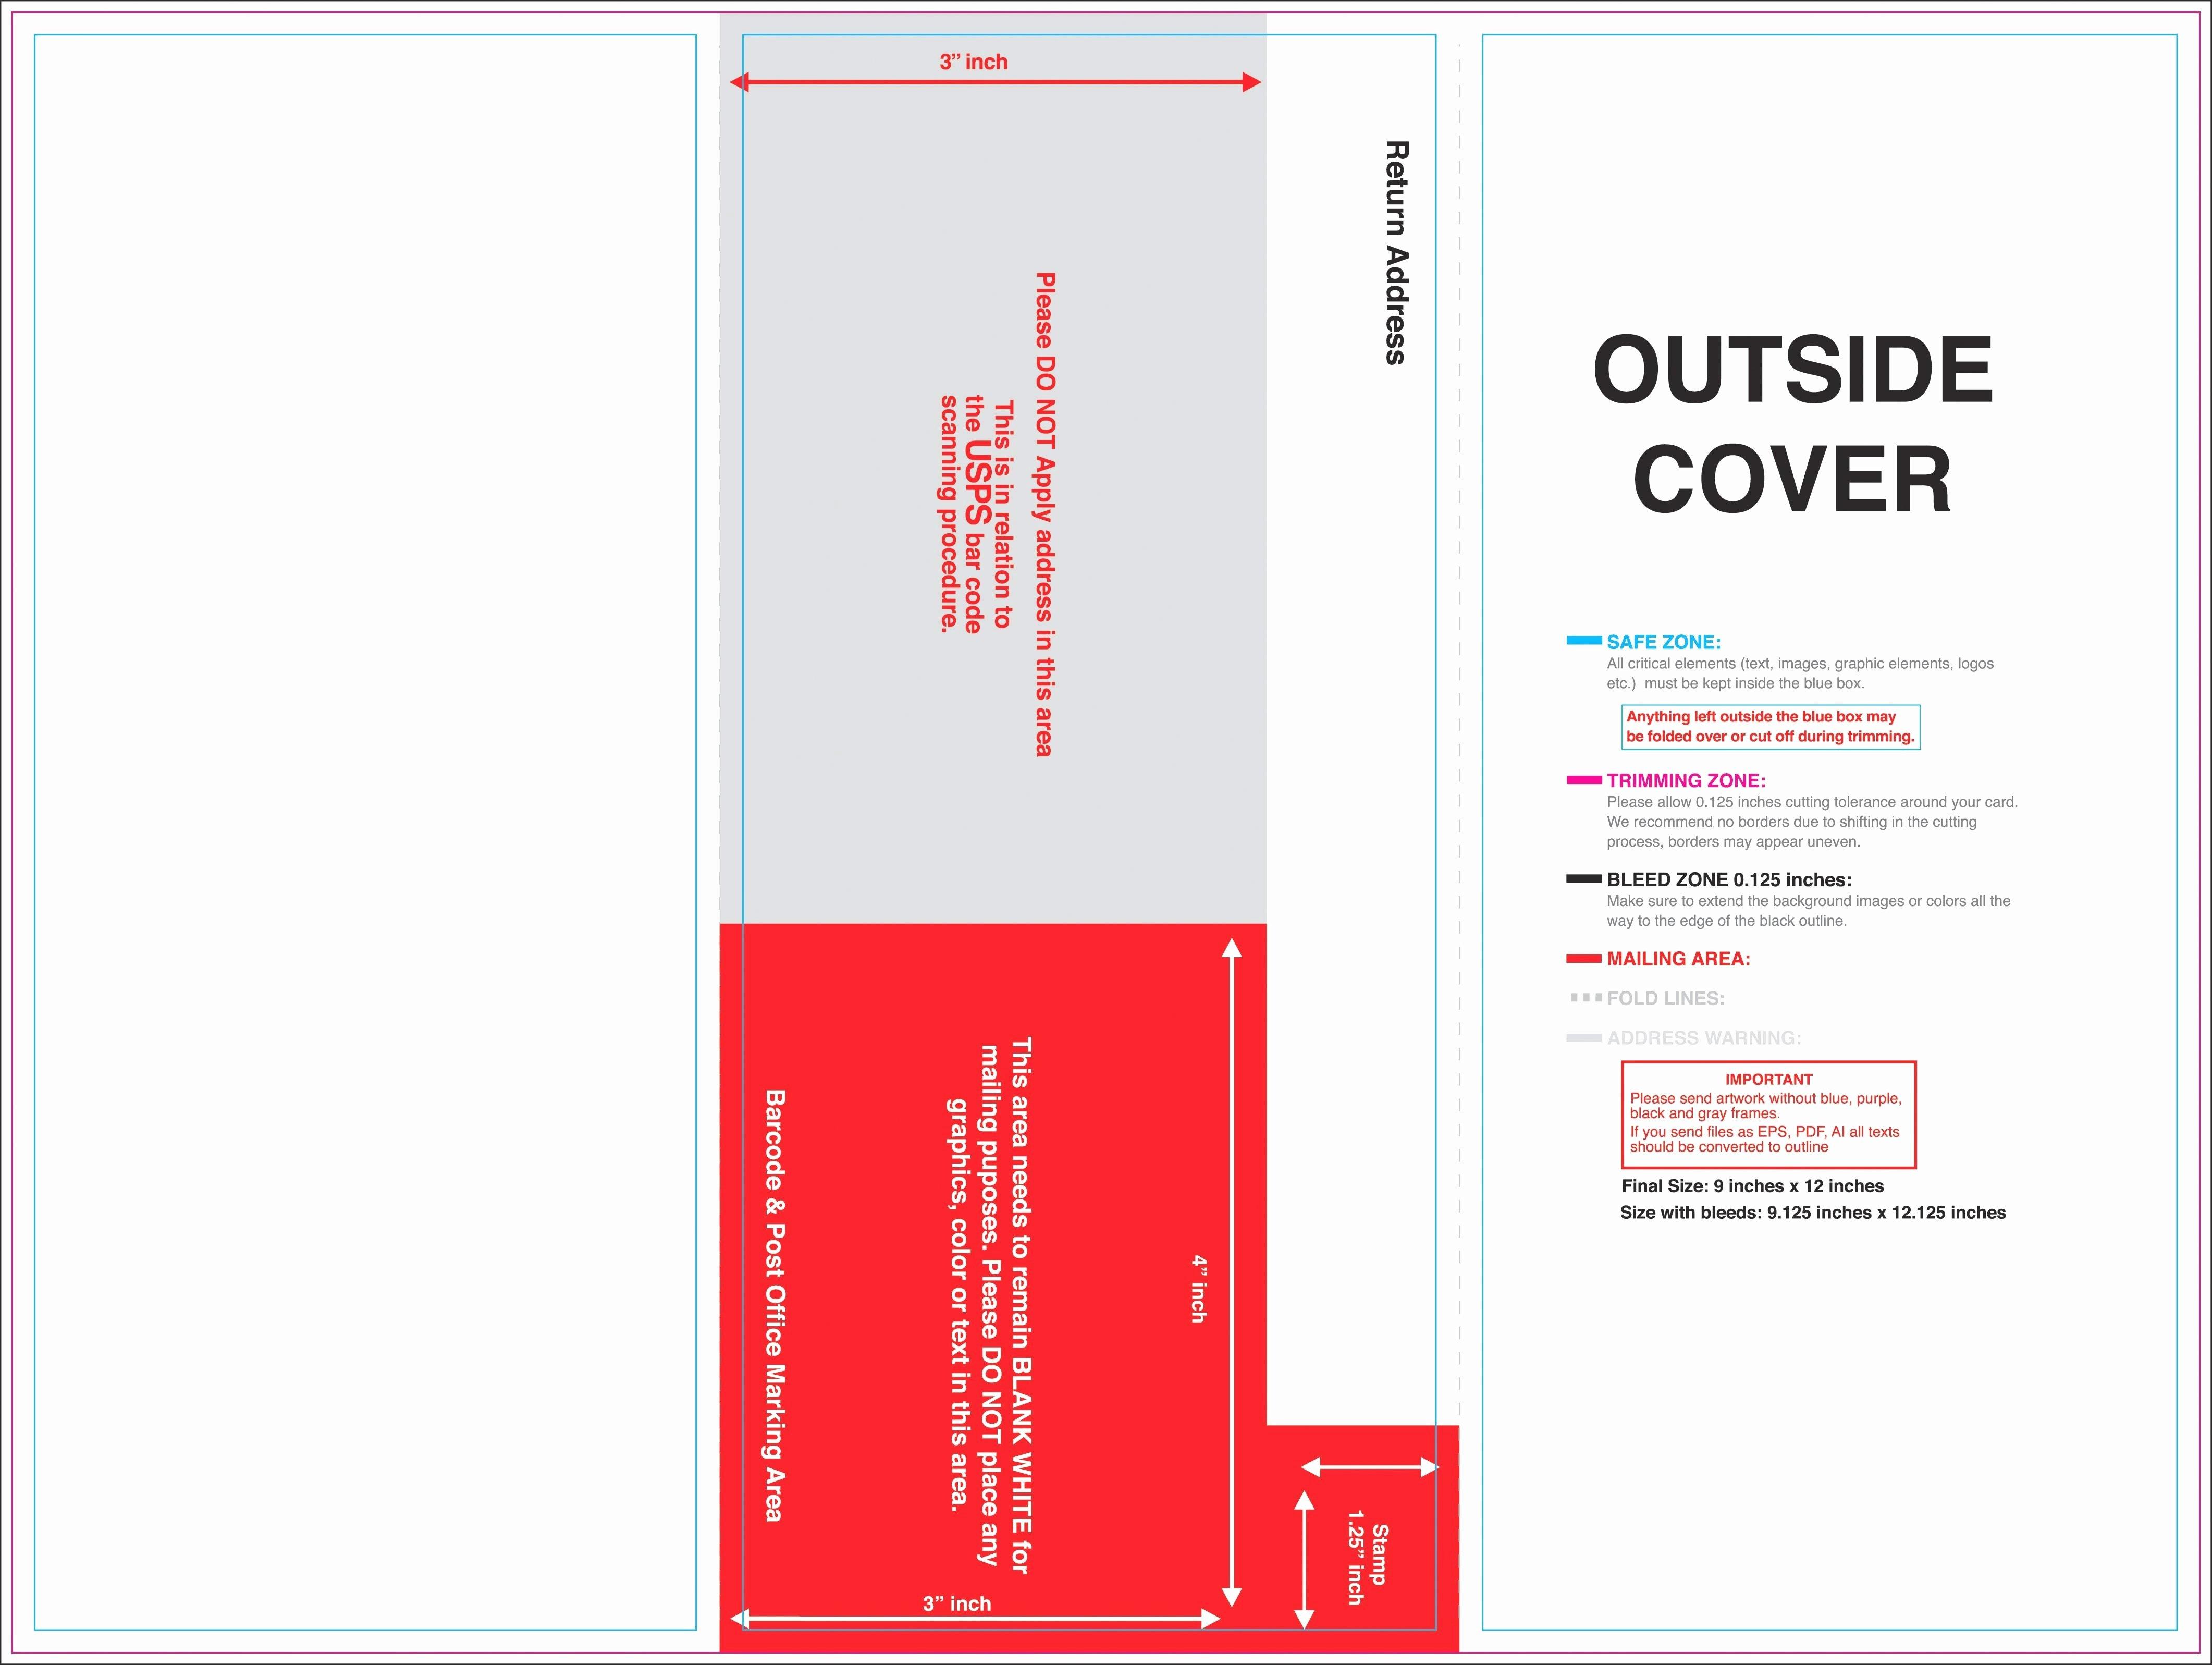 Tri Fold Template Indesign Inspirational 50 Best Adobe Indesign Tri Fold Brochure Template